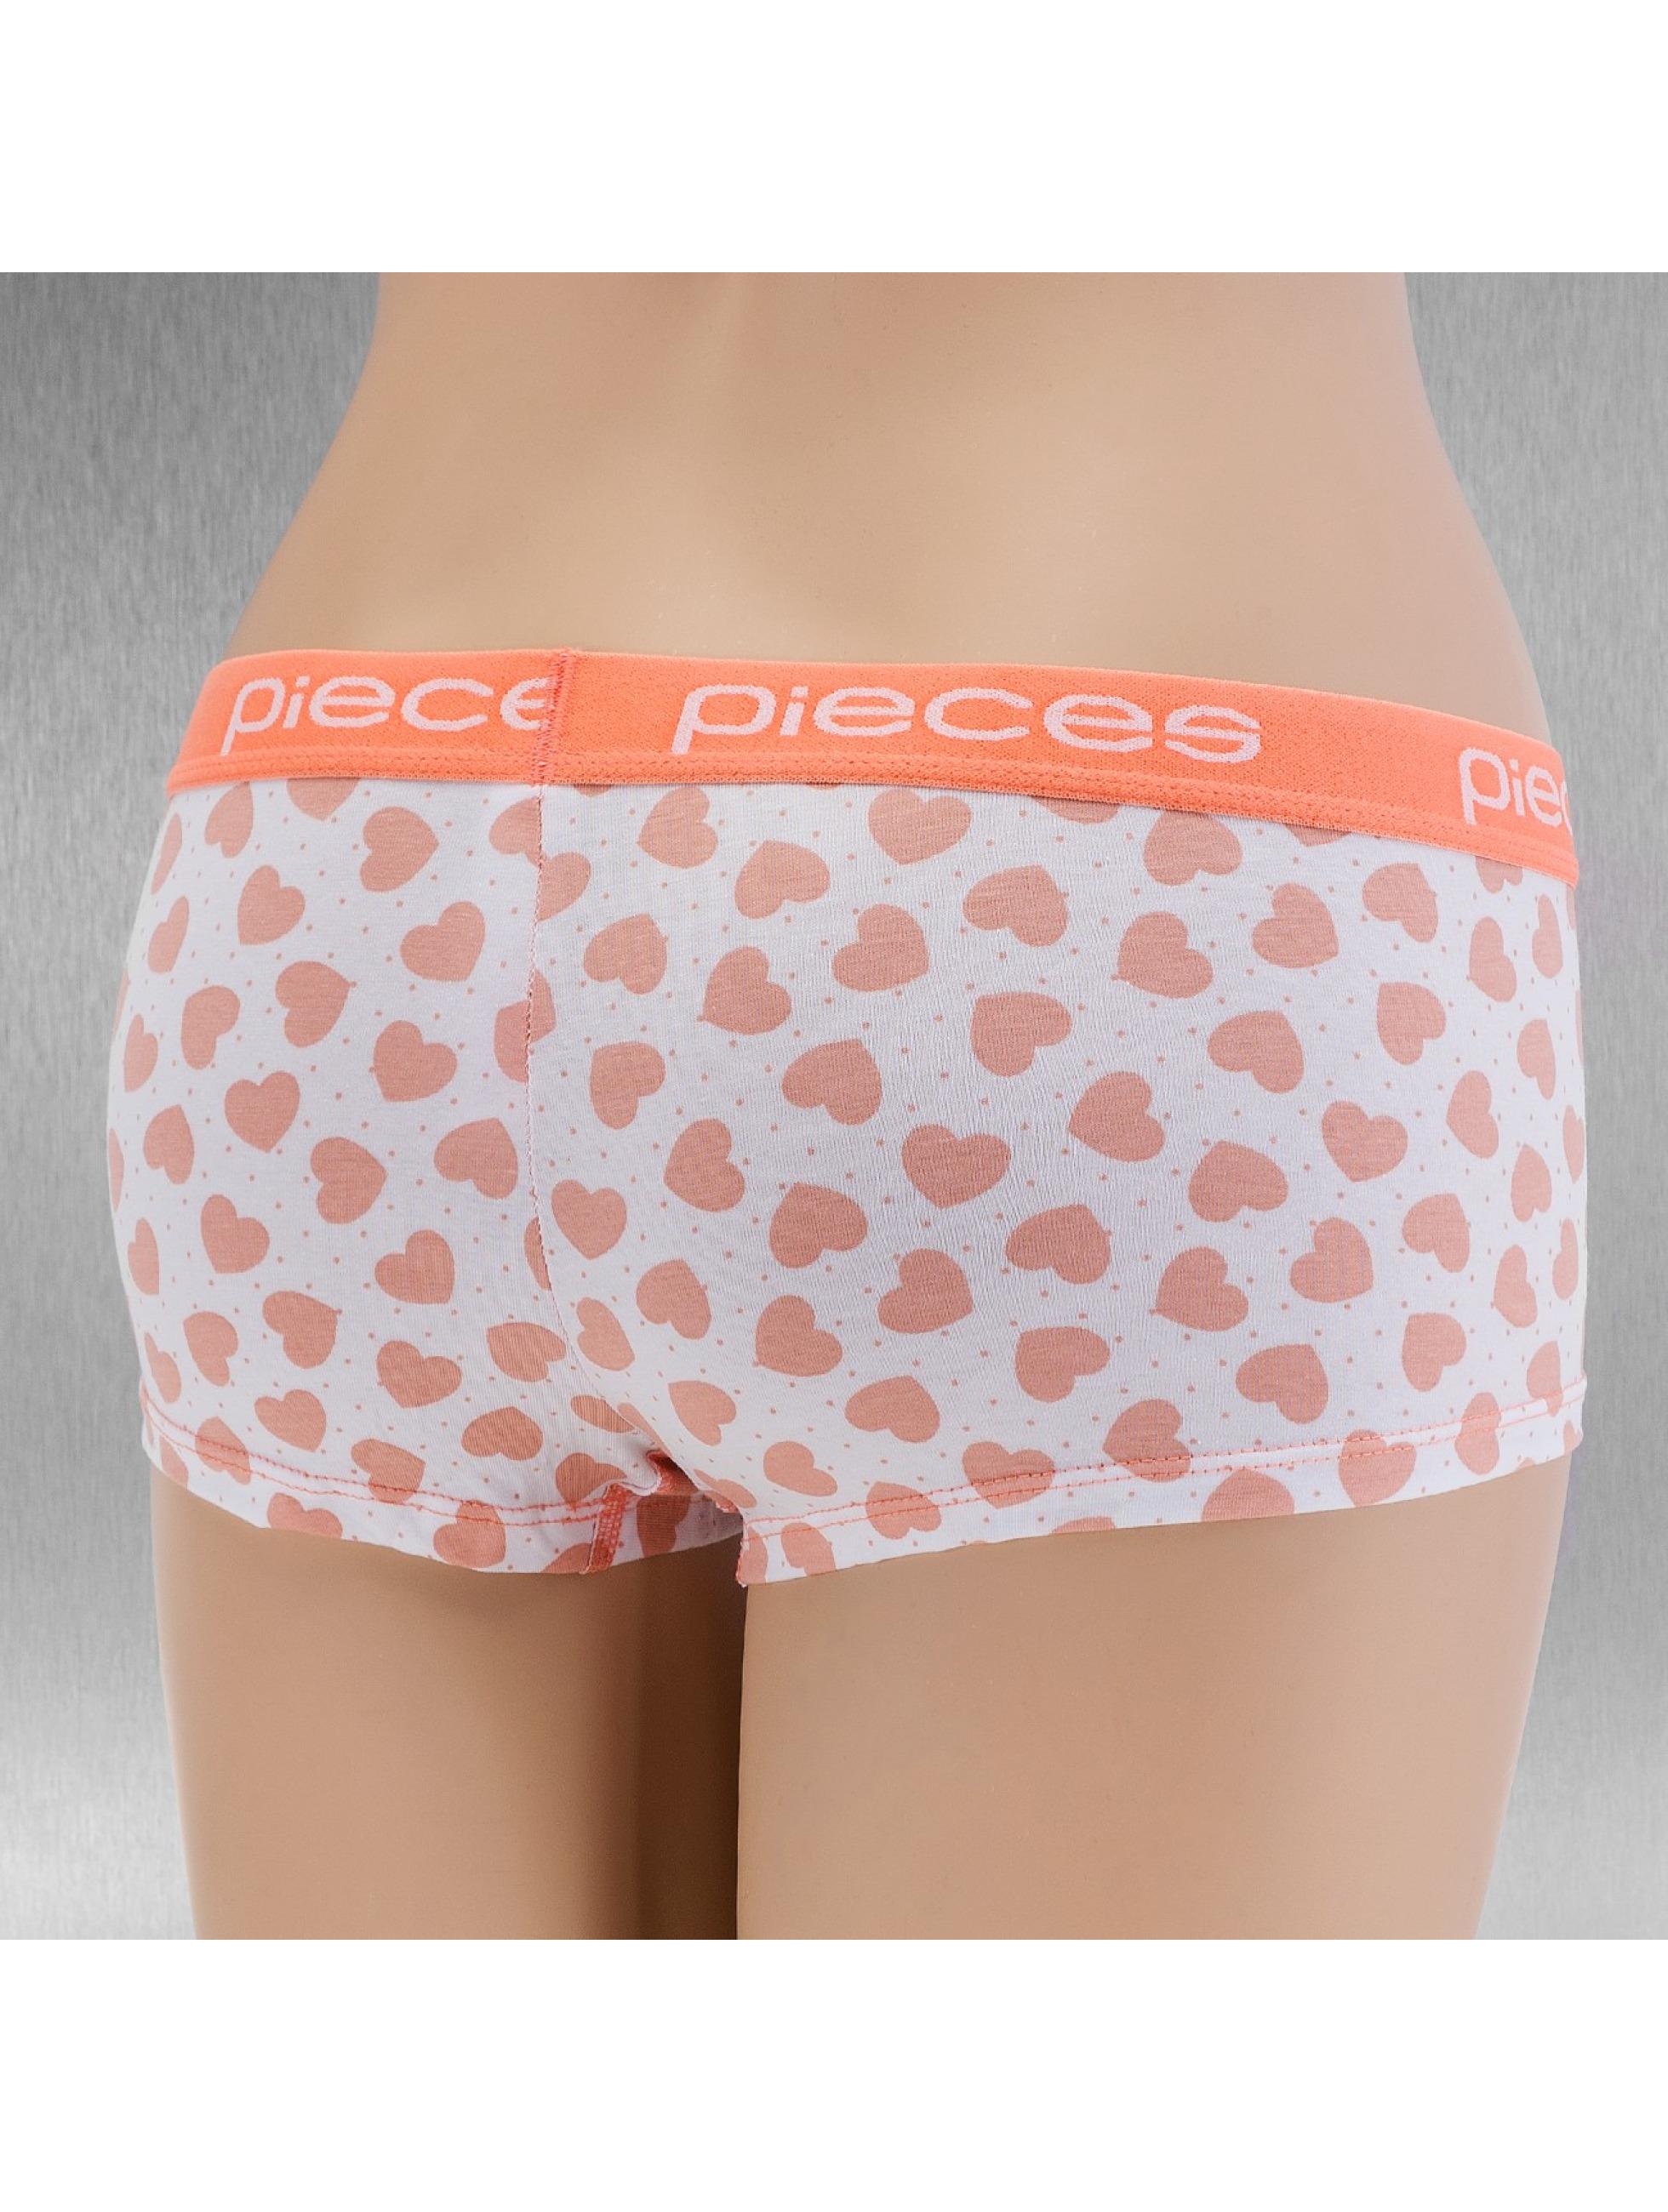 Pieces Unterwäsche pcLogo orange